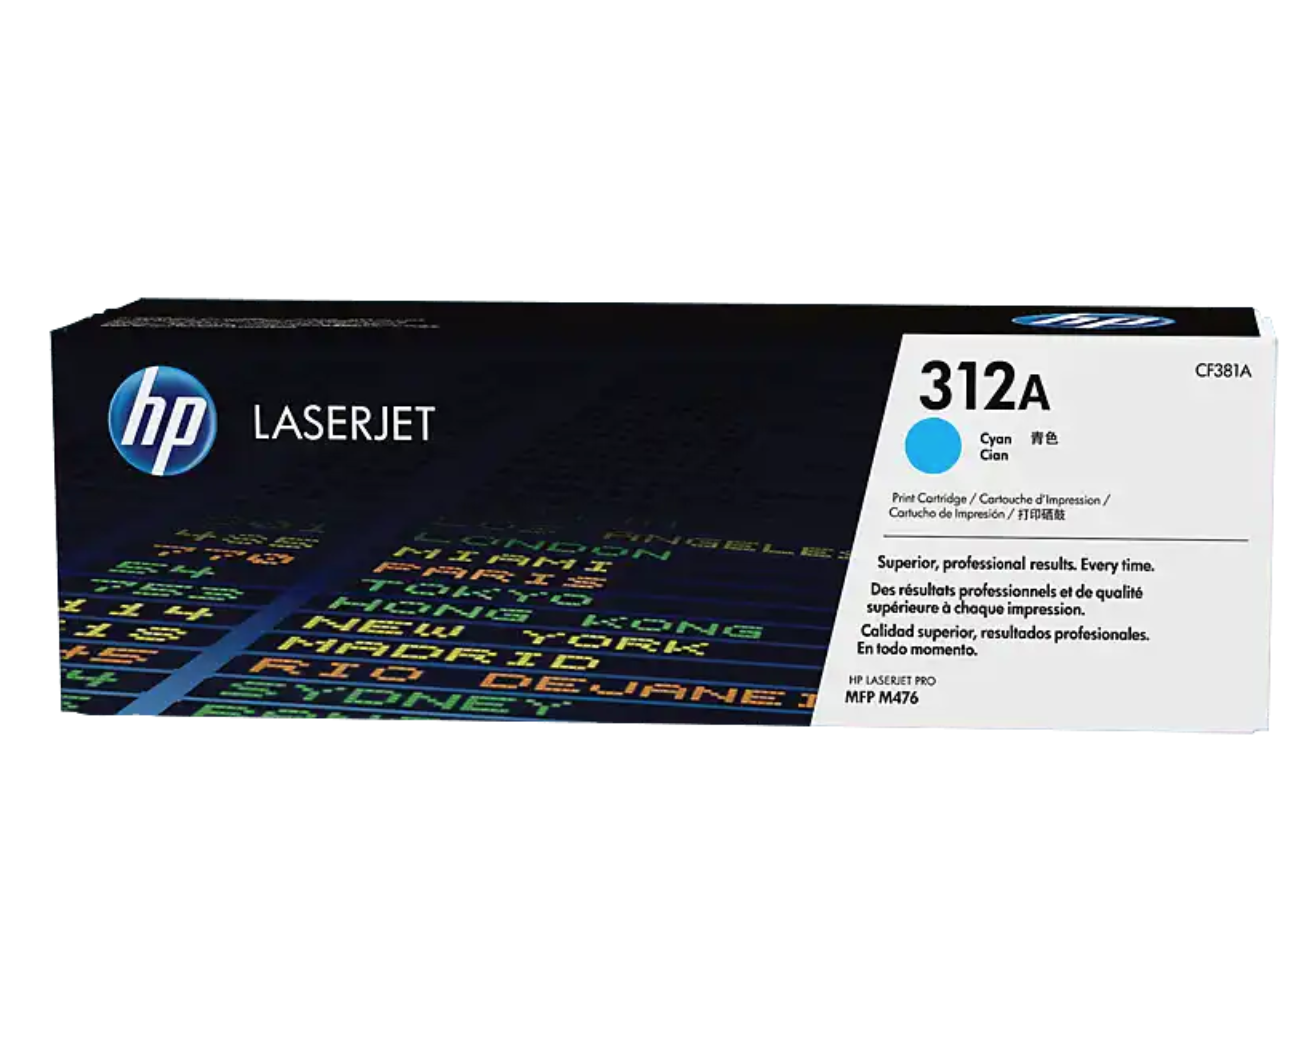 HP 312A 綻藍原廠 LaserJet 碳粉 CF381A